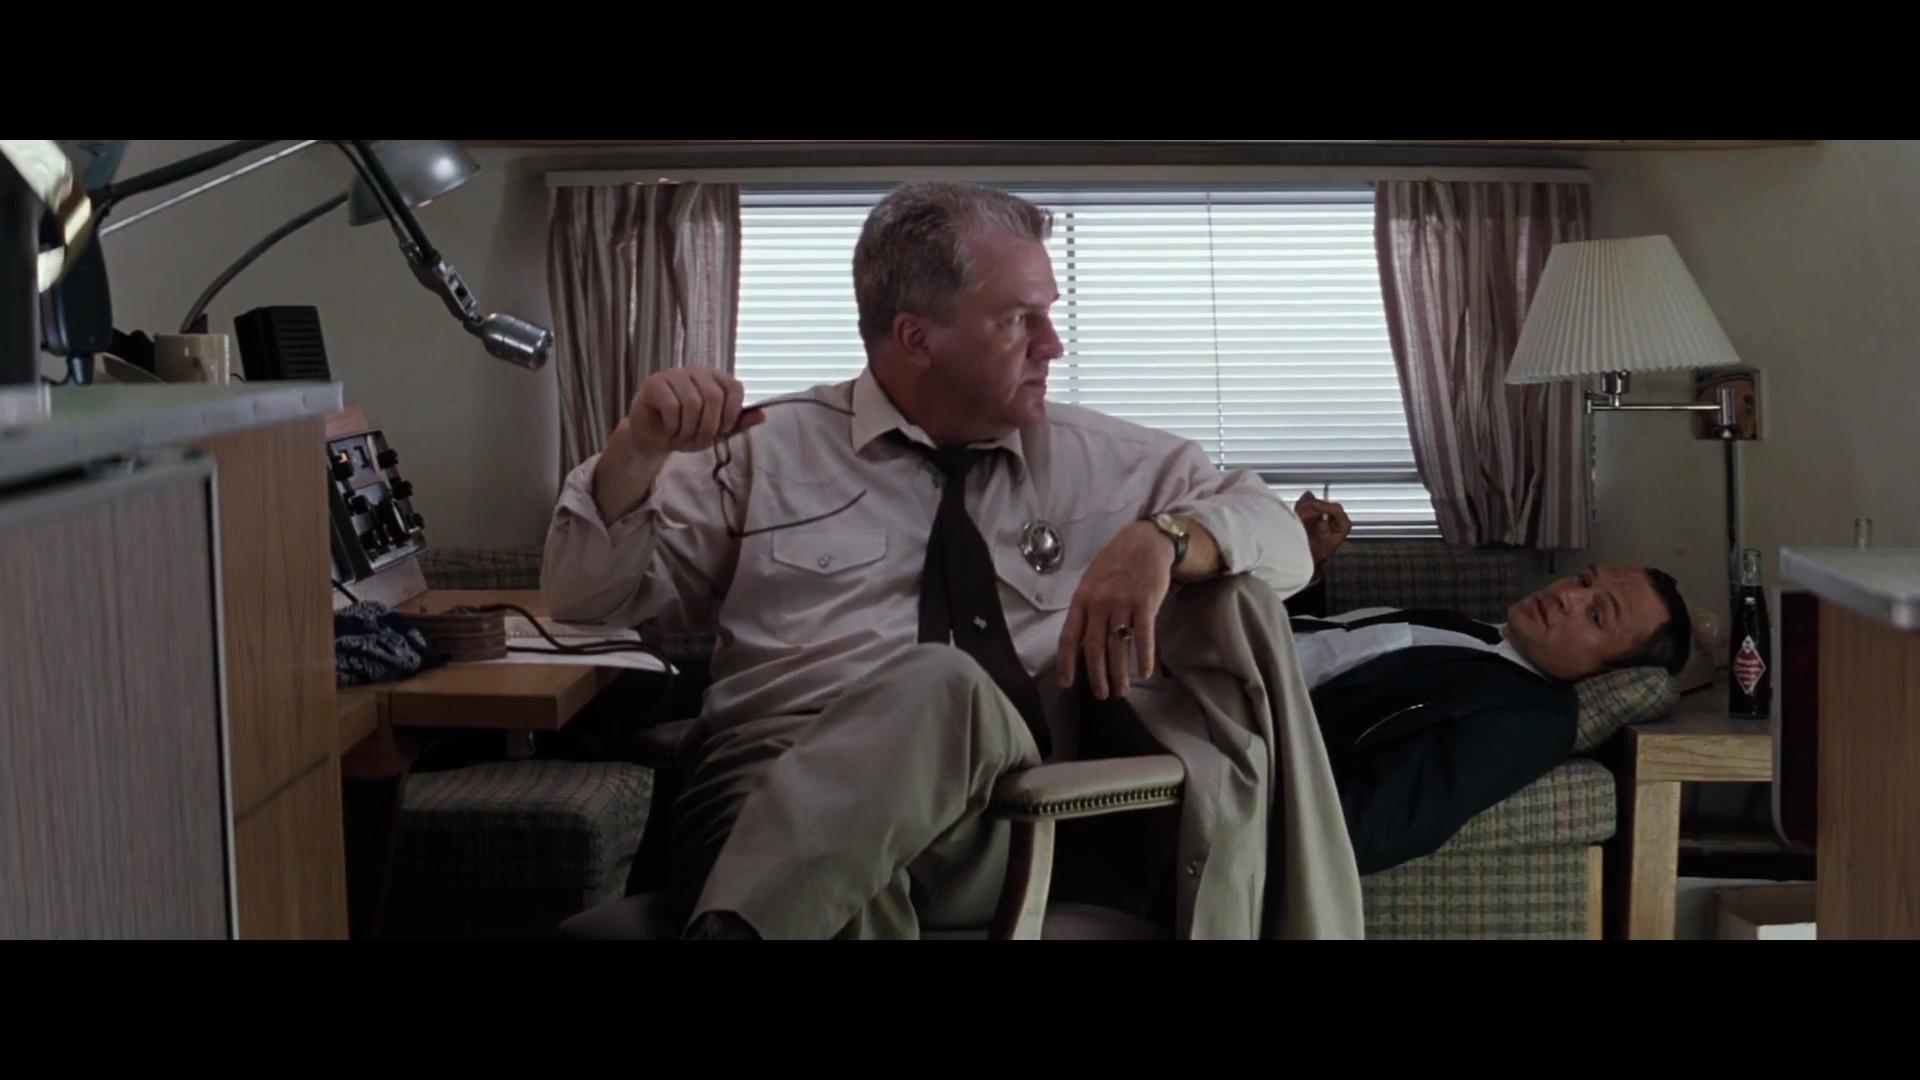 Un Mundo Perfecto 1080p Lat-Cast-Ing[Drama](1993)